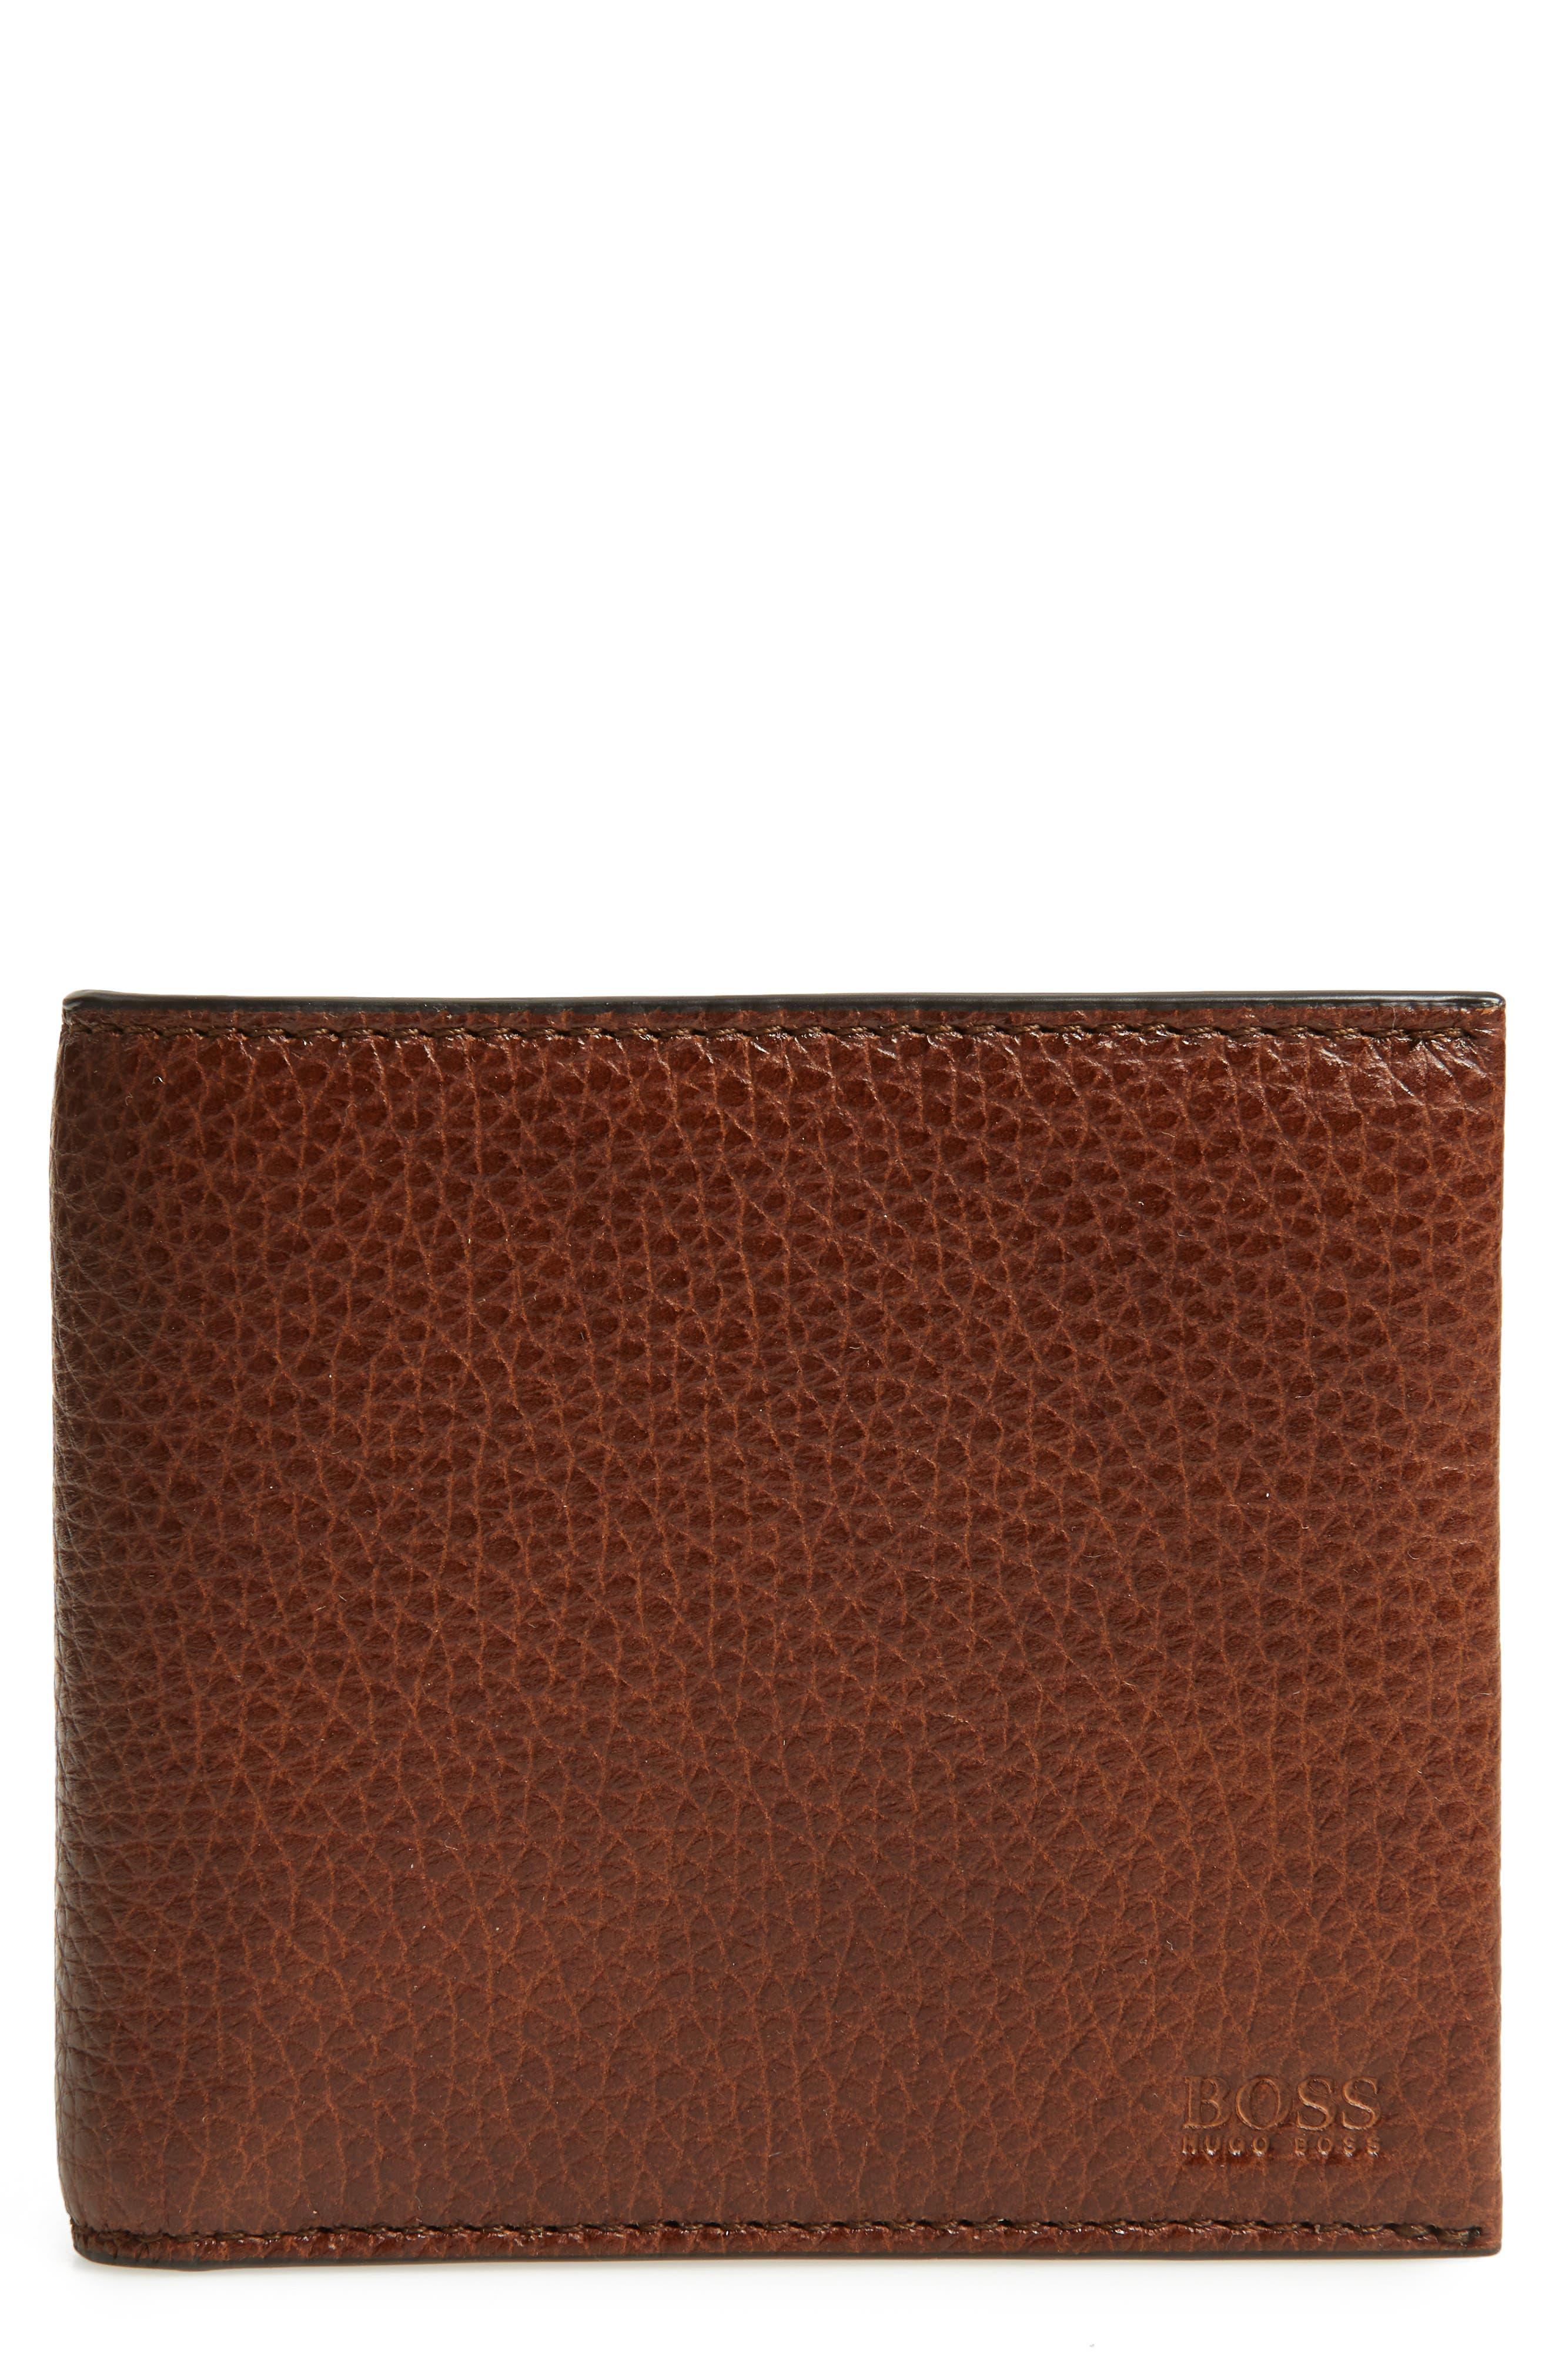 Traveller Leather Wallet,                             Main thumbnail 1, color,                             MEDIUM BROWN